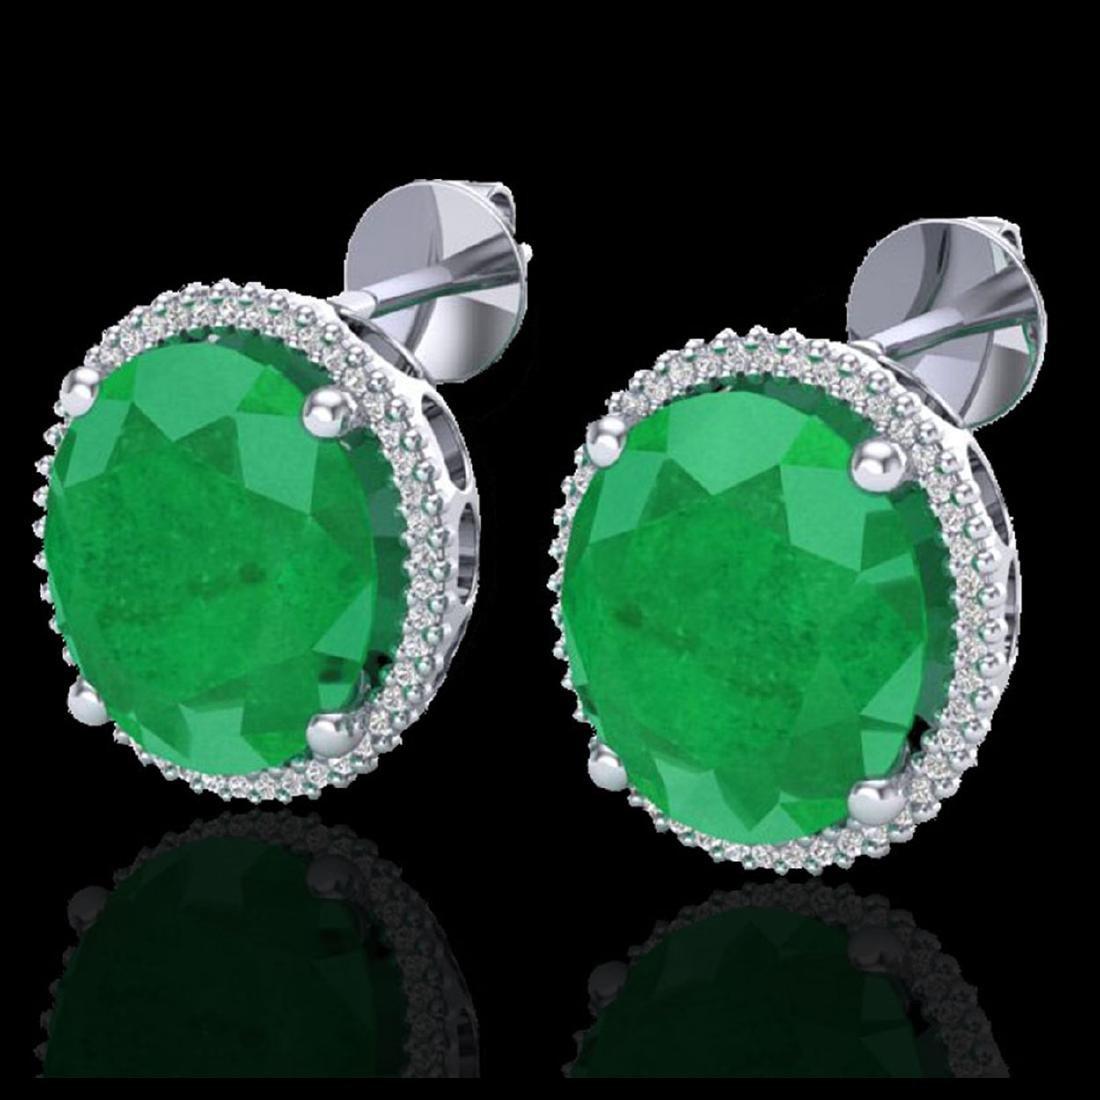 25 CTW Emerald & Micro Pave VS/SI Diamond Halo Earrings